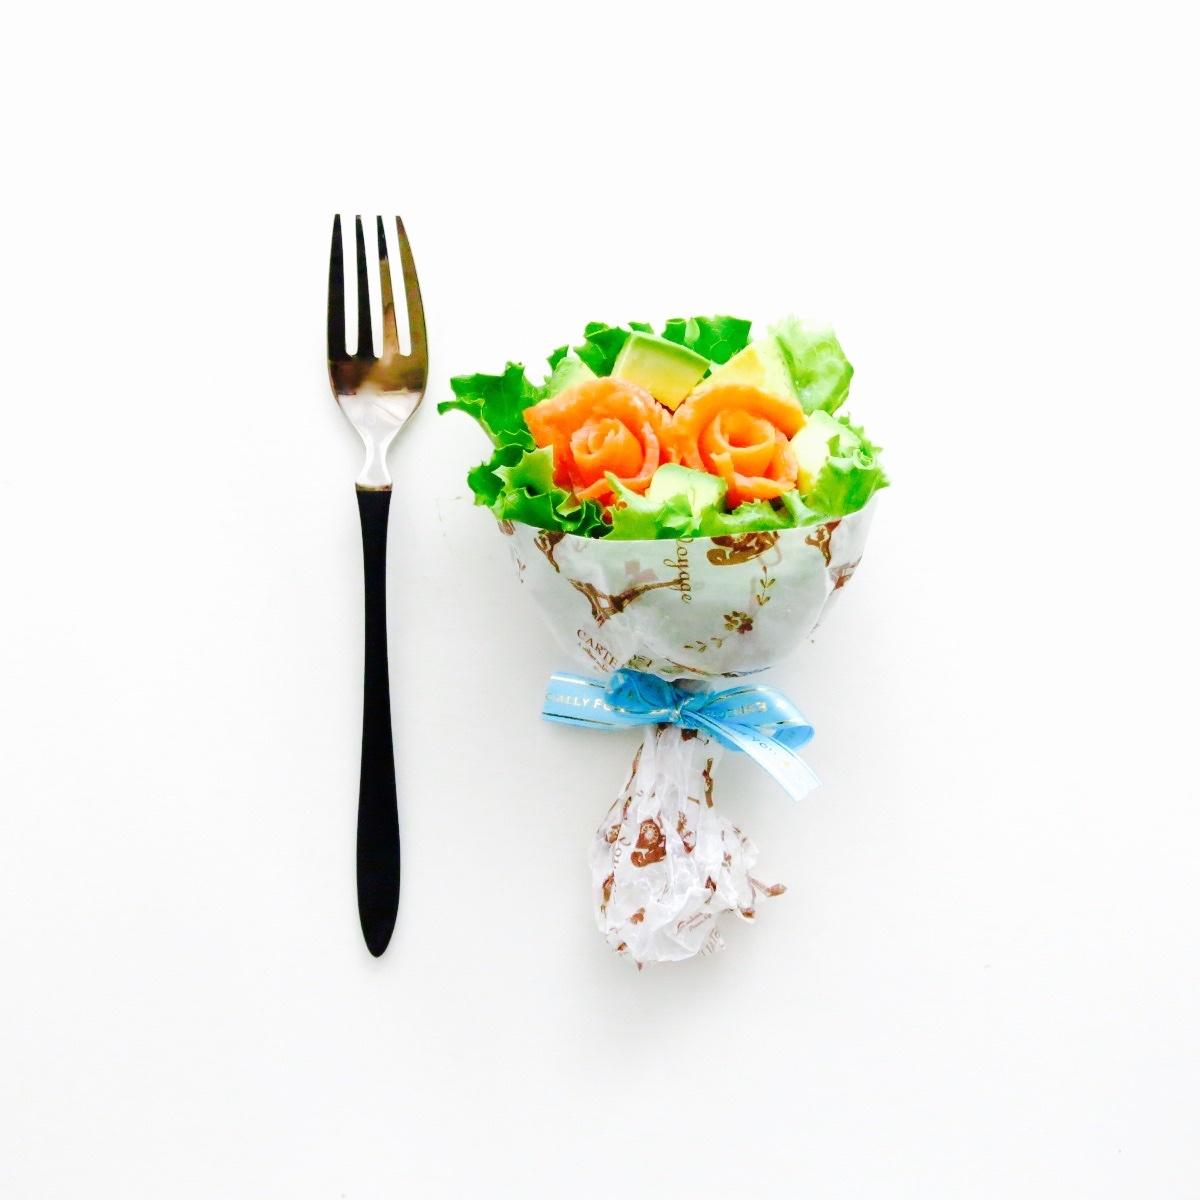 151006_EC_bouquetsalad.jpg